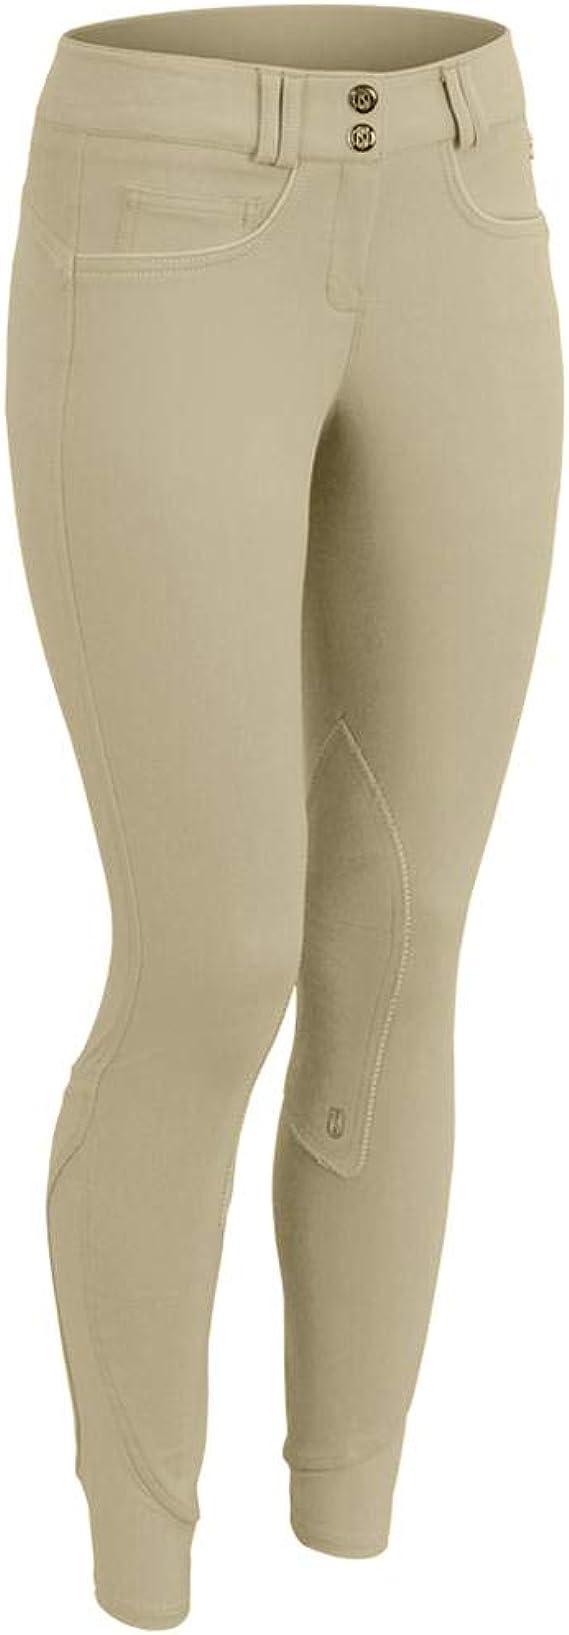 Equi-Star Ladies Pull On Breeches